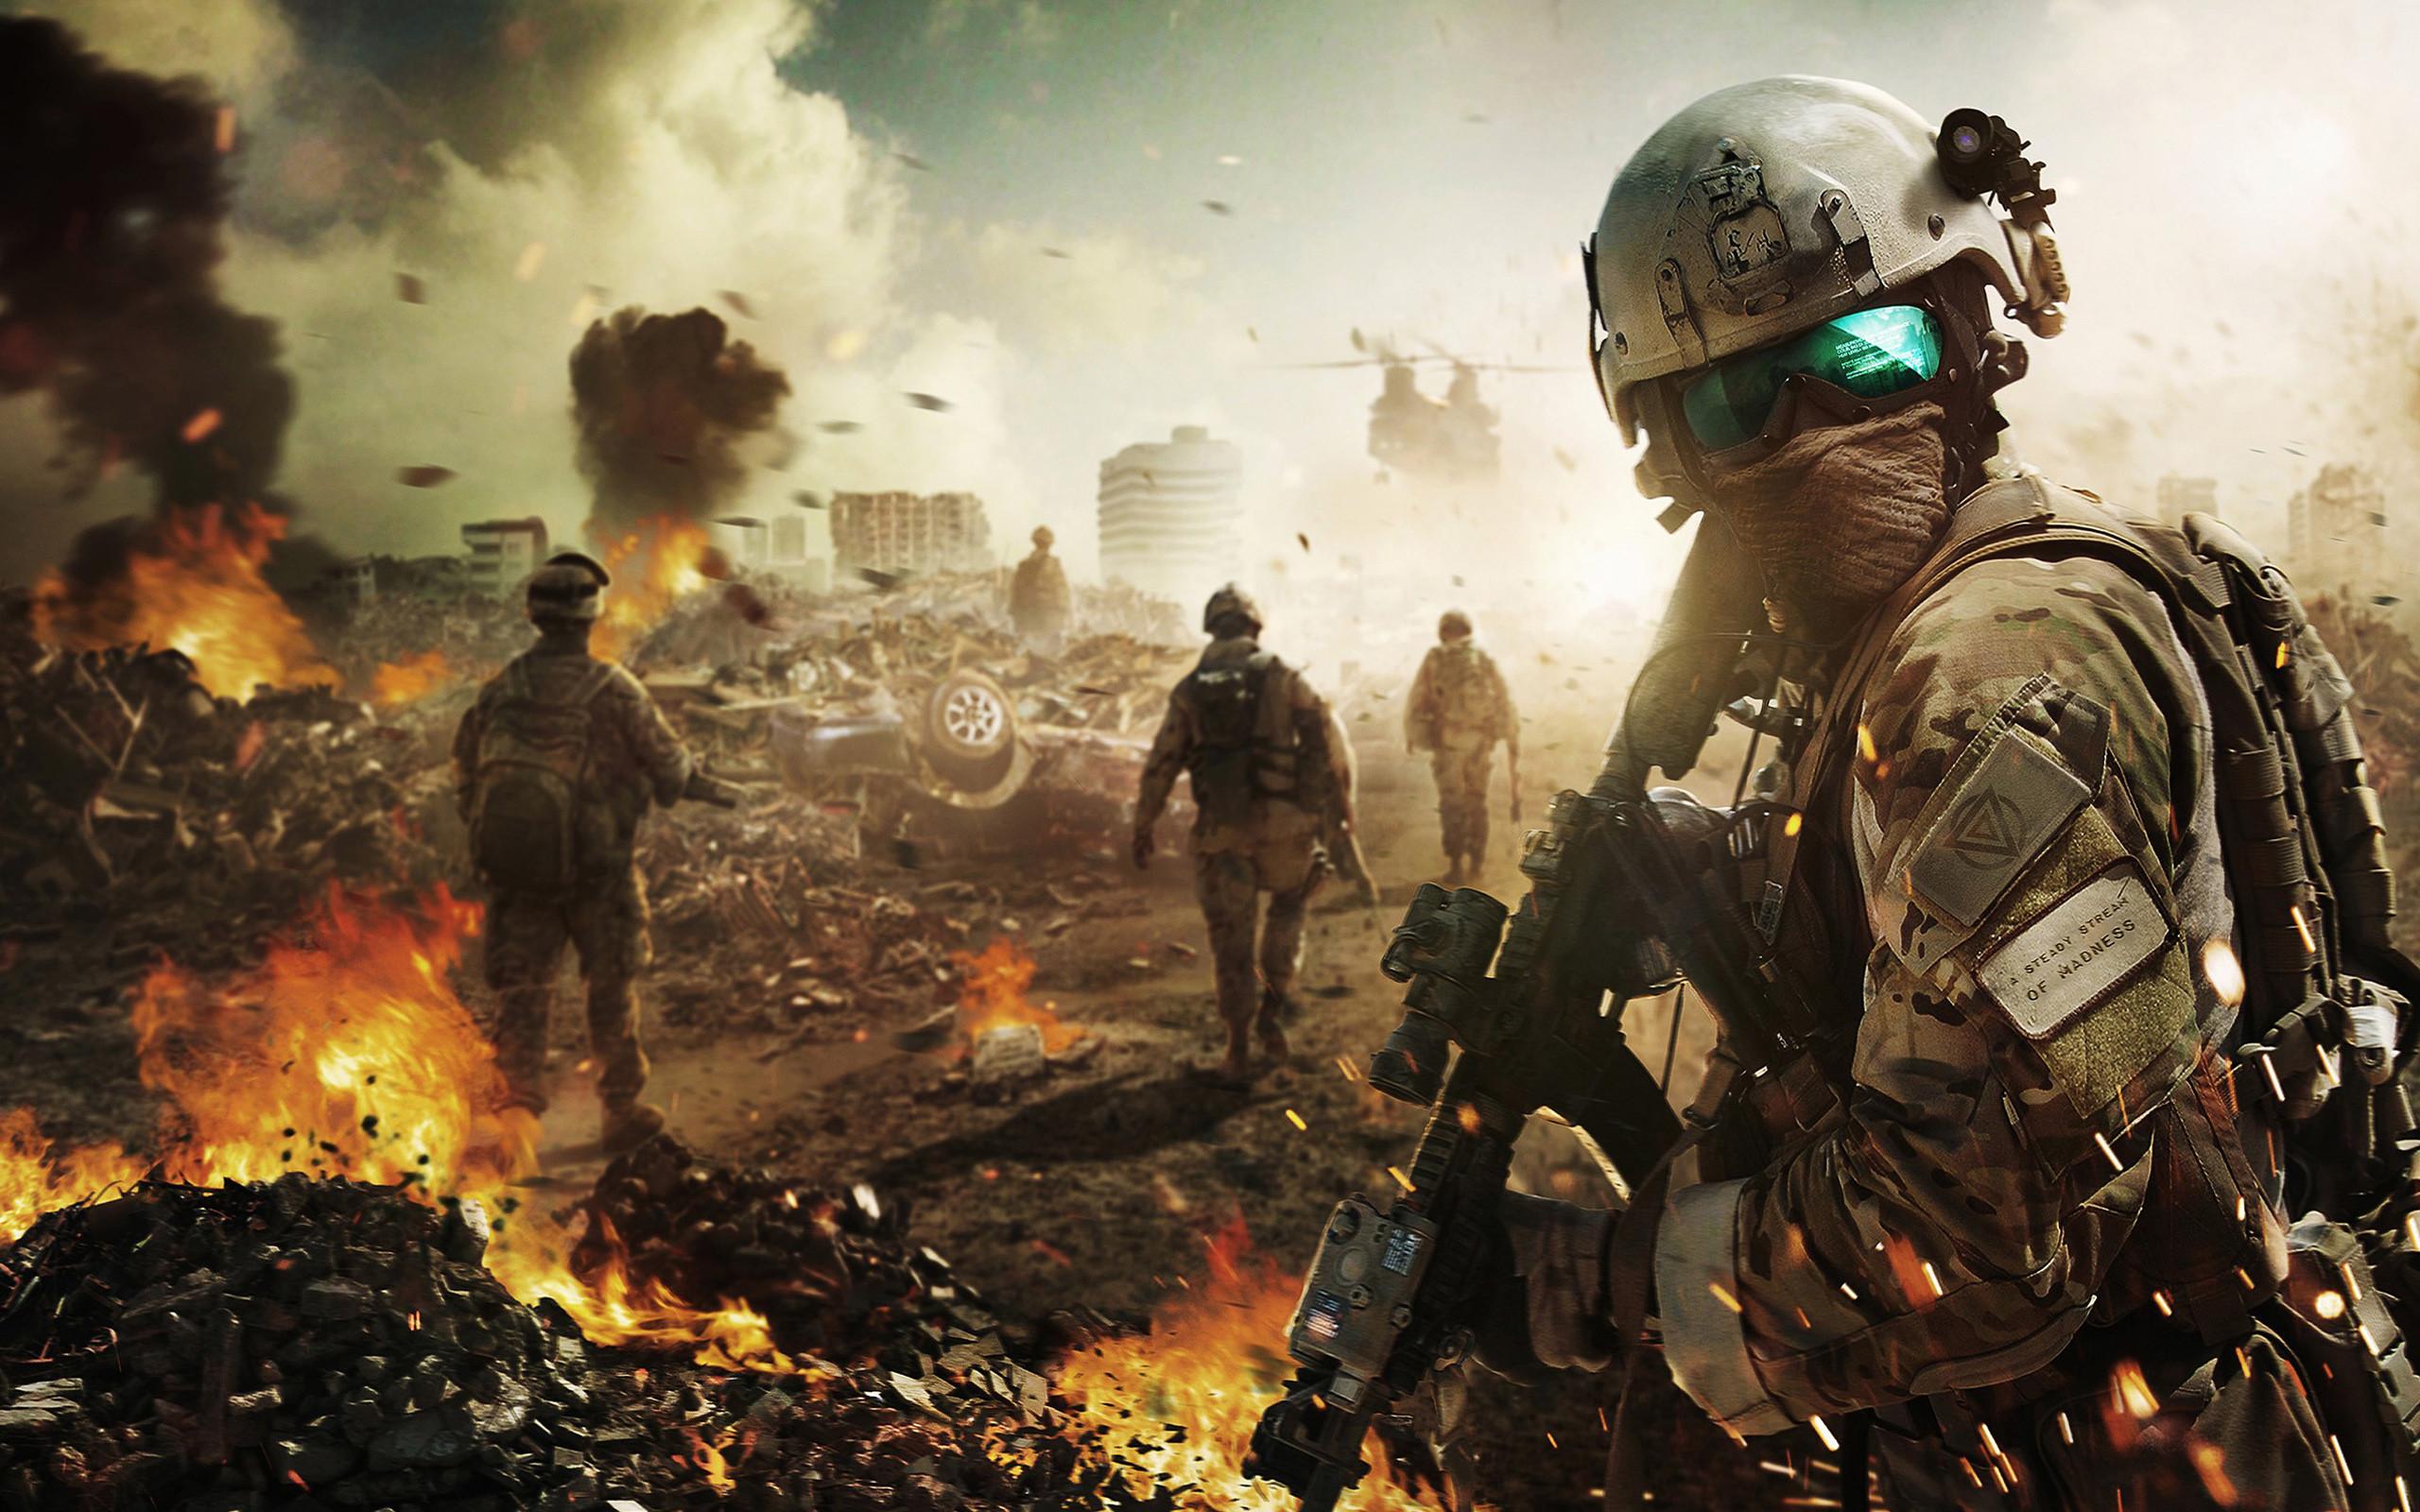 Res: 2560x1600, Battlefield Soldier Wallpaper